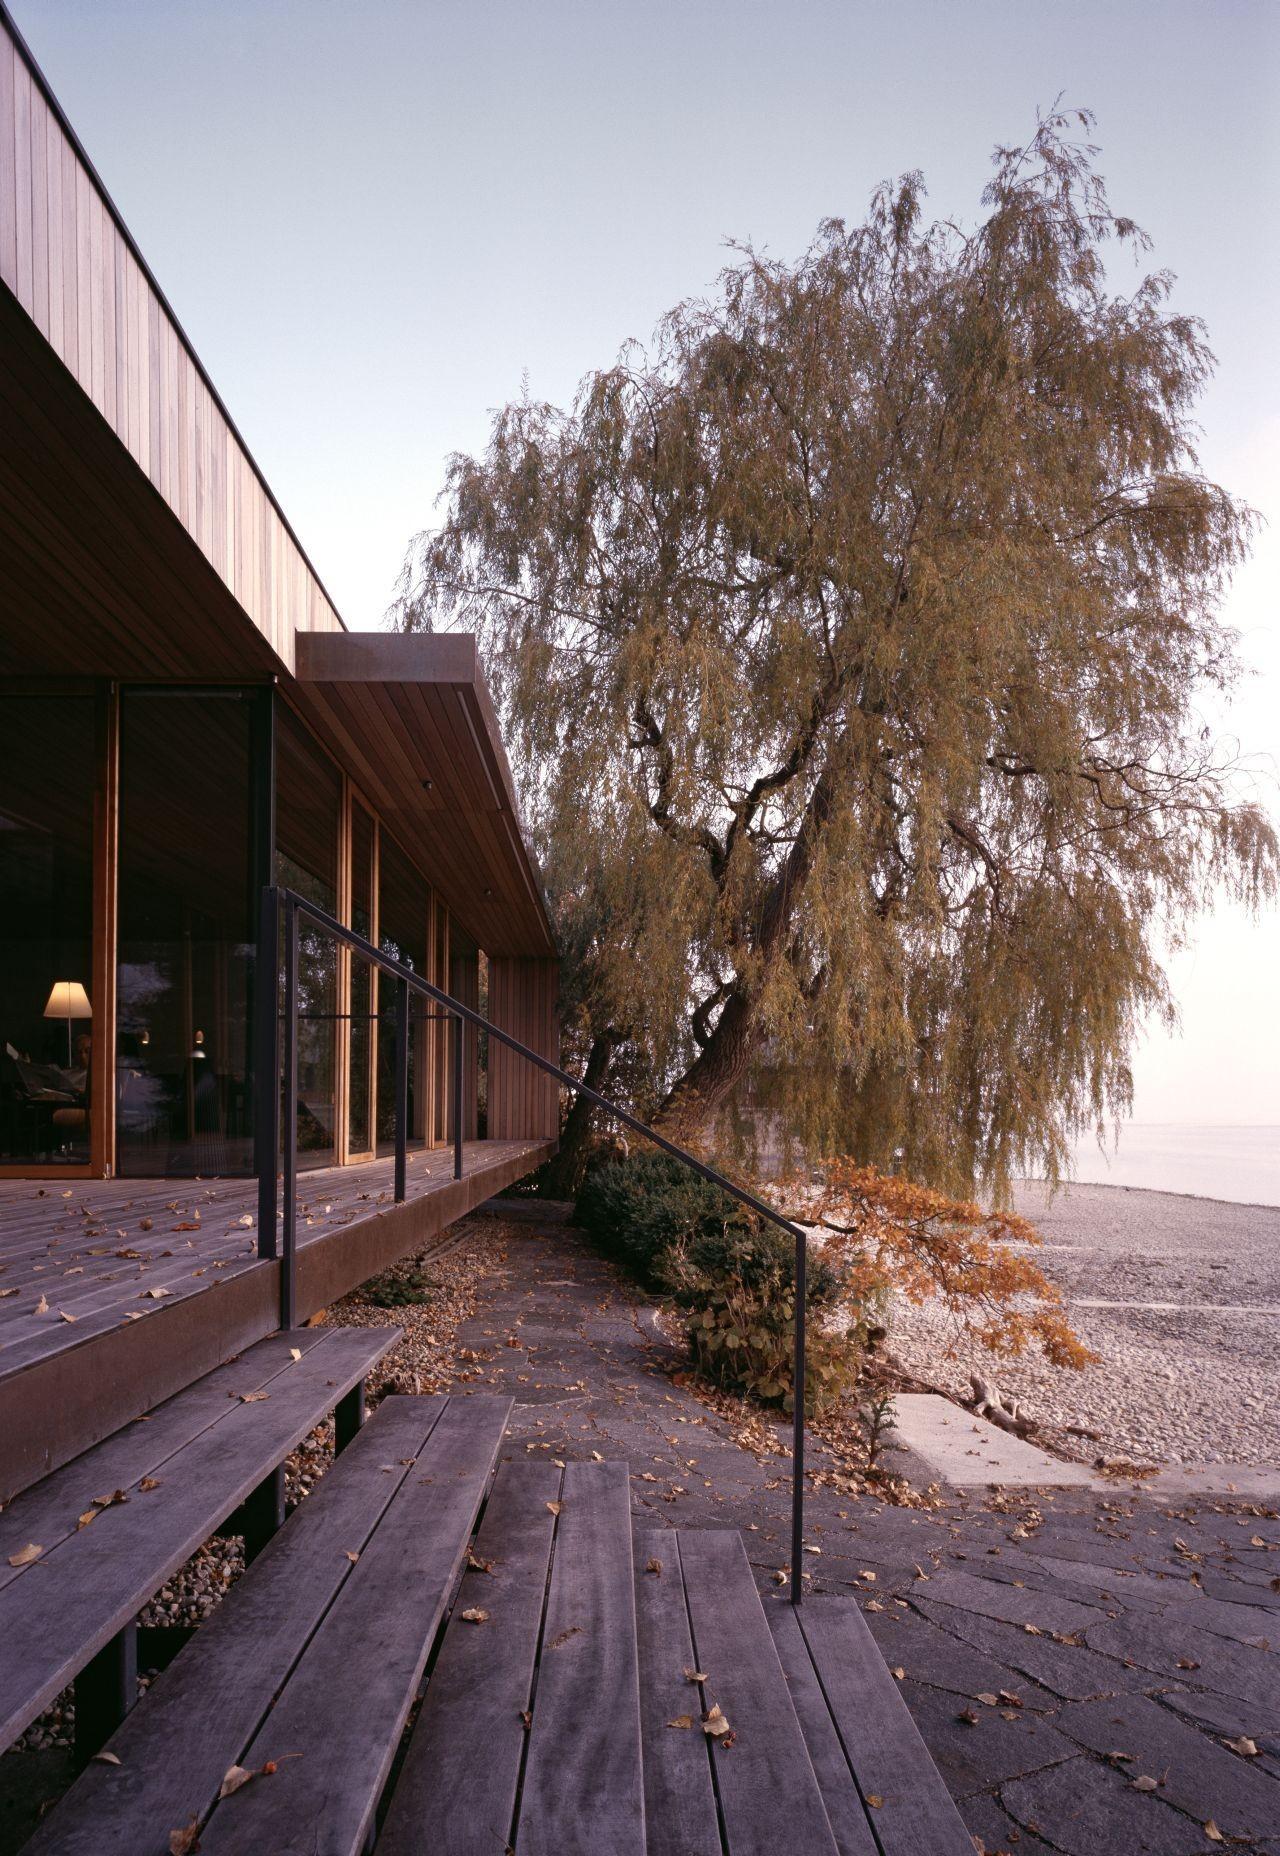 Lindau house a lovely contemporary home by k m architektur in germany - Architekten lindau ...